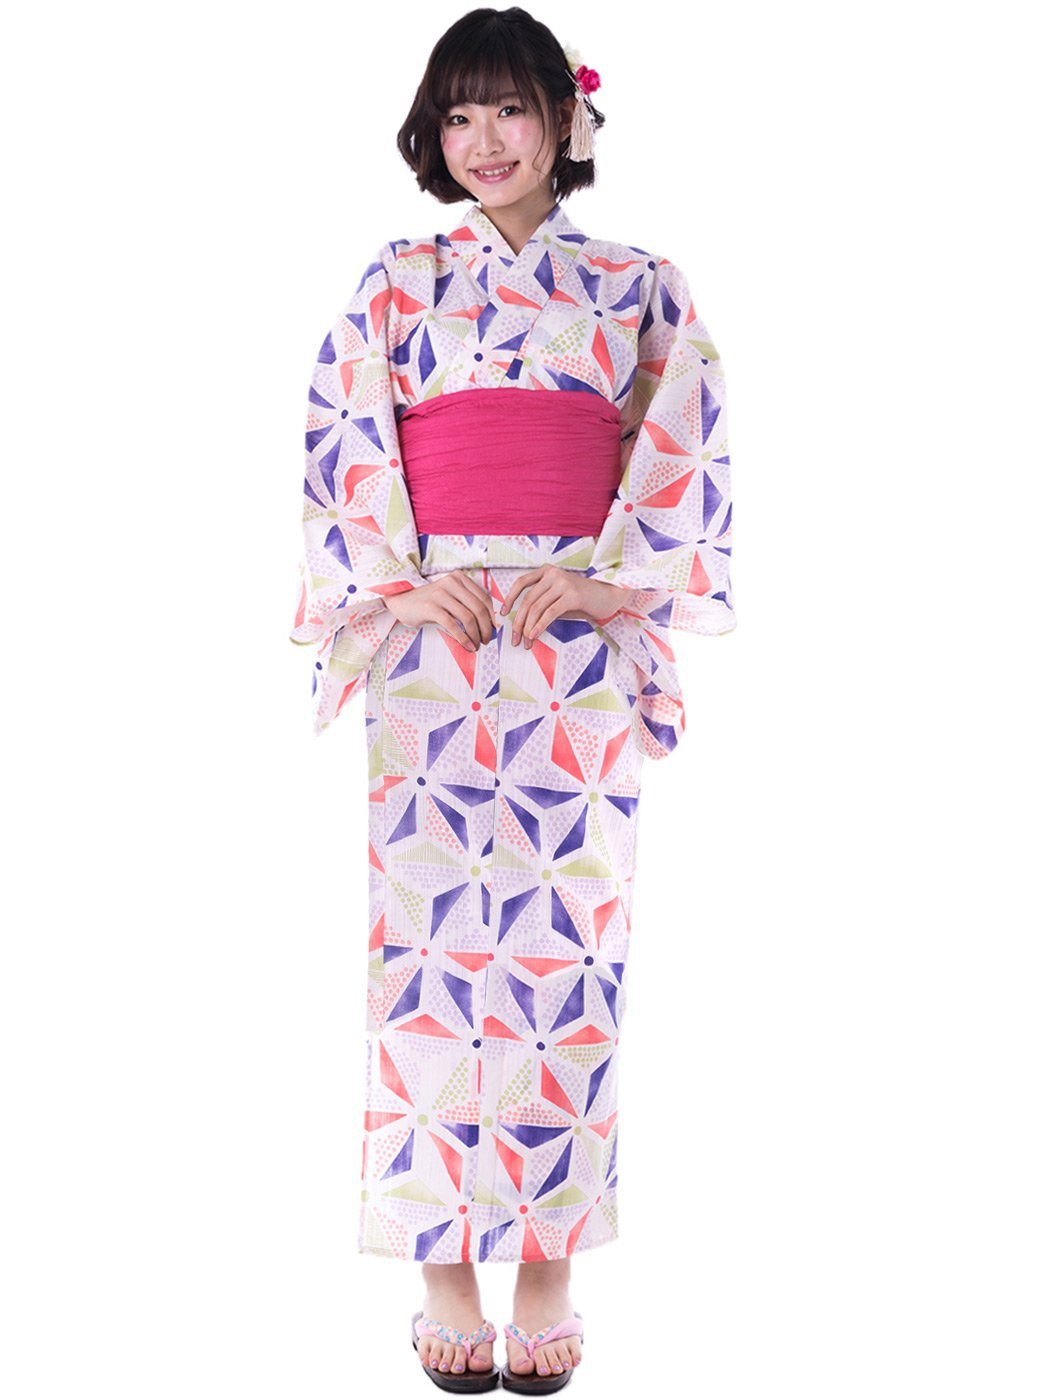 KYOETSU Women's Cute Yukata 3 Piece Set (Yukata/Obi/Geta sandals) (XX-Small (Japan Size S), FM-6(Obi Cherry))